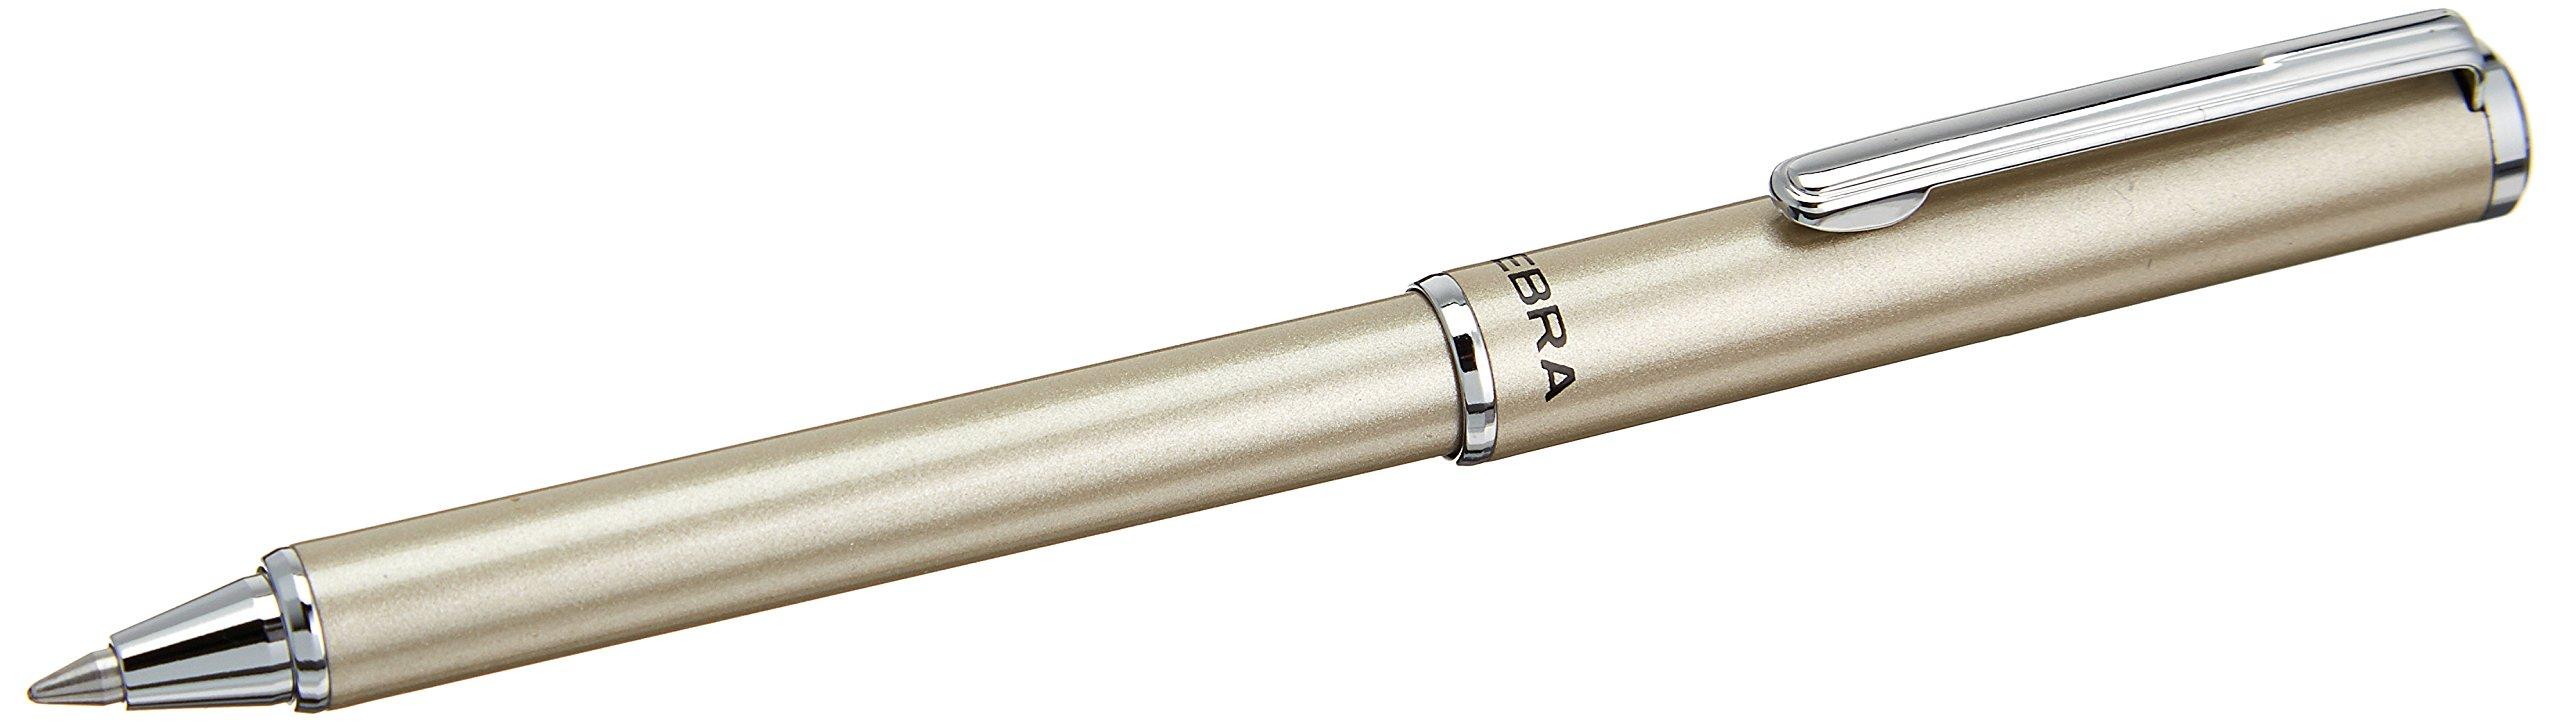 1 Mini Lapicera de 0.7mm color plateado Marca Zebra